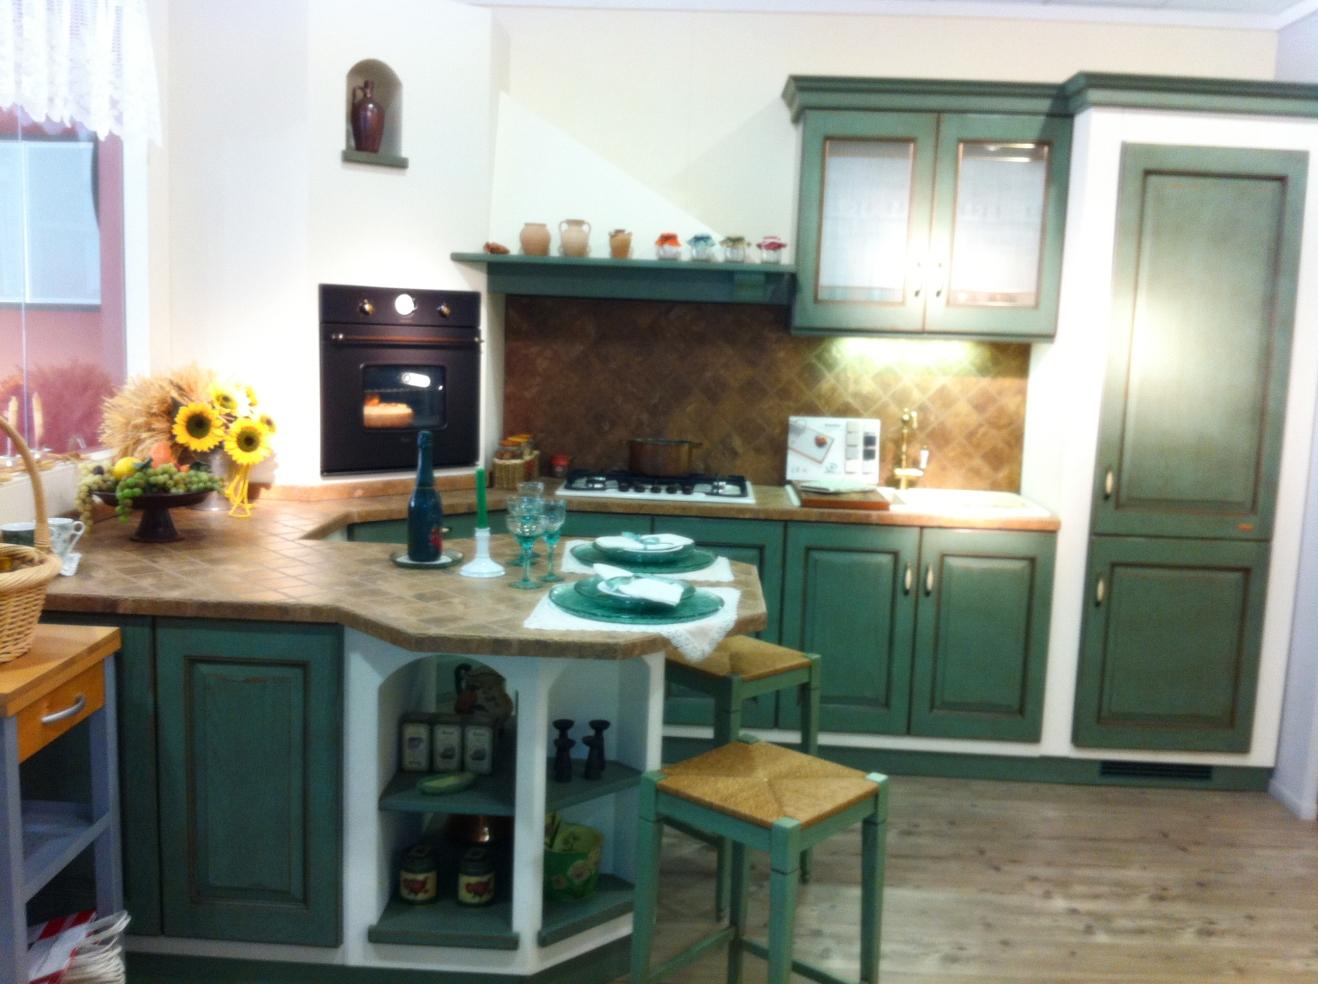 Scavolini Cucine In Muratura. Amazing Cucine In Muratura Scavolini ...